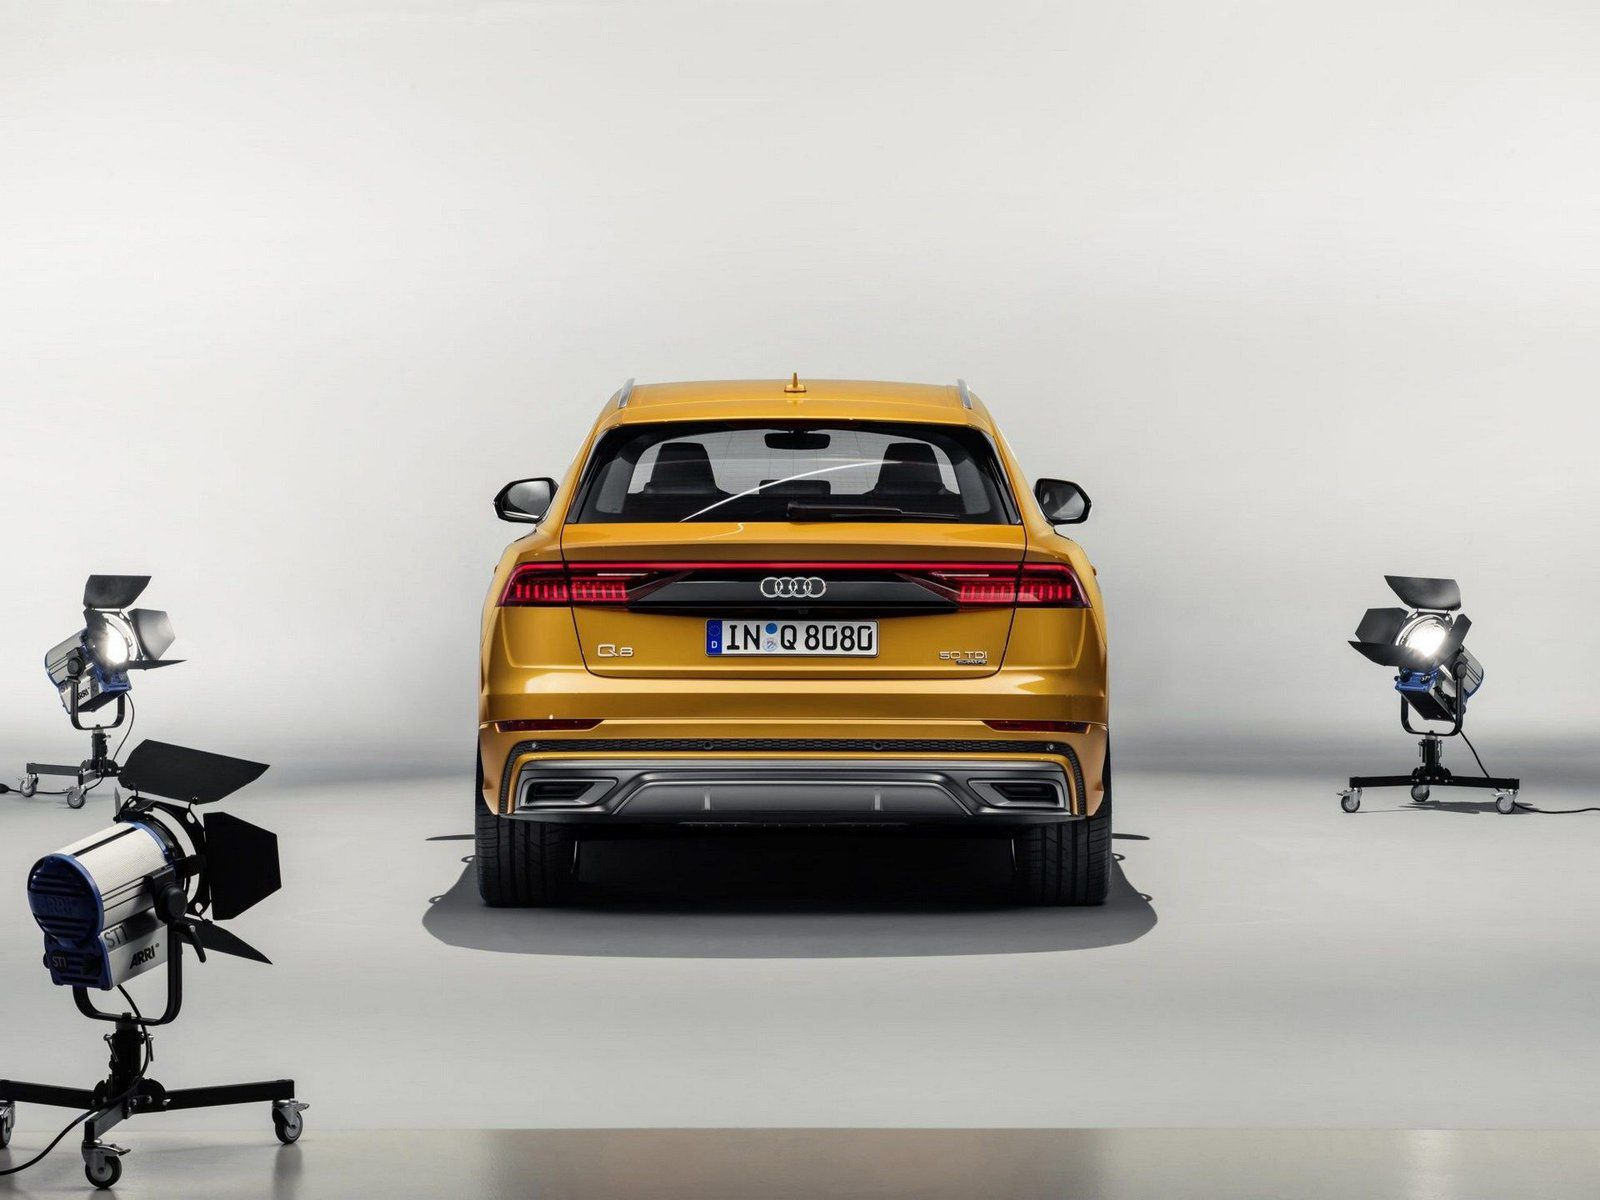 Audi Q8 : Simple coup marketing ou vrai modèle pertinent ?